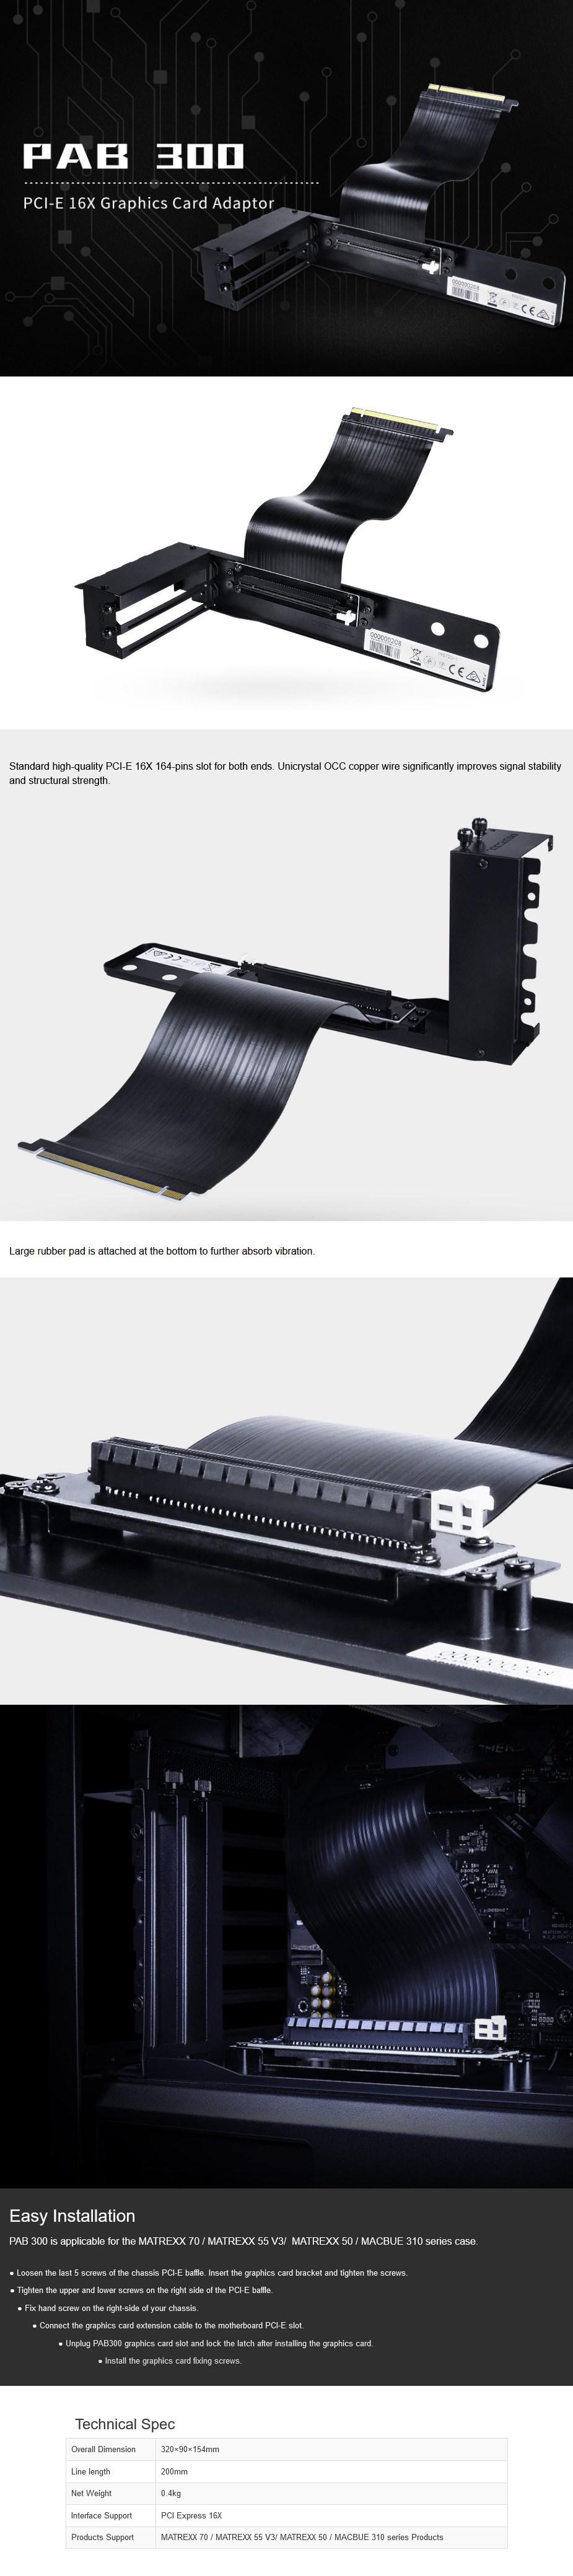 deepcool-pab-300-pcie-x16af-graphics-card-adaptor-ac35663-3.jpg